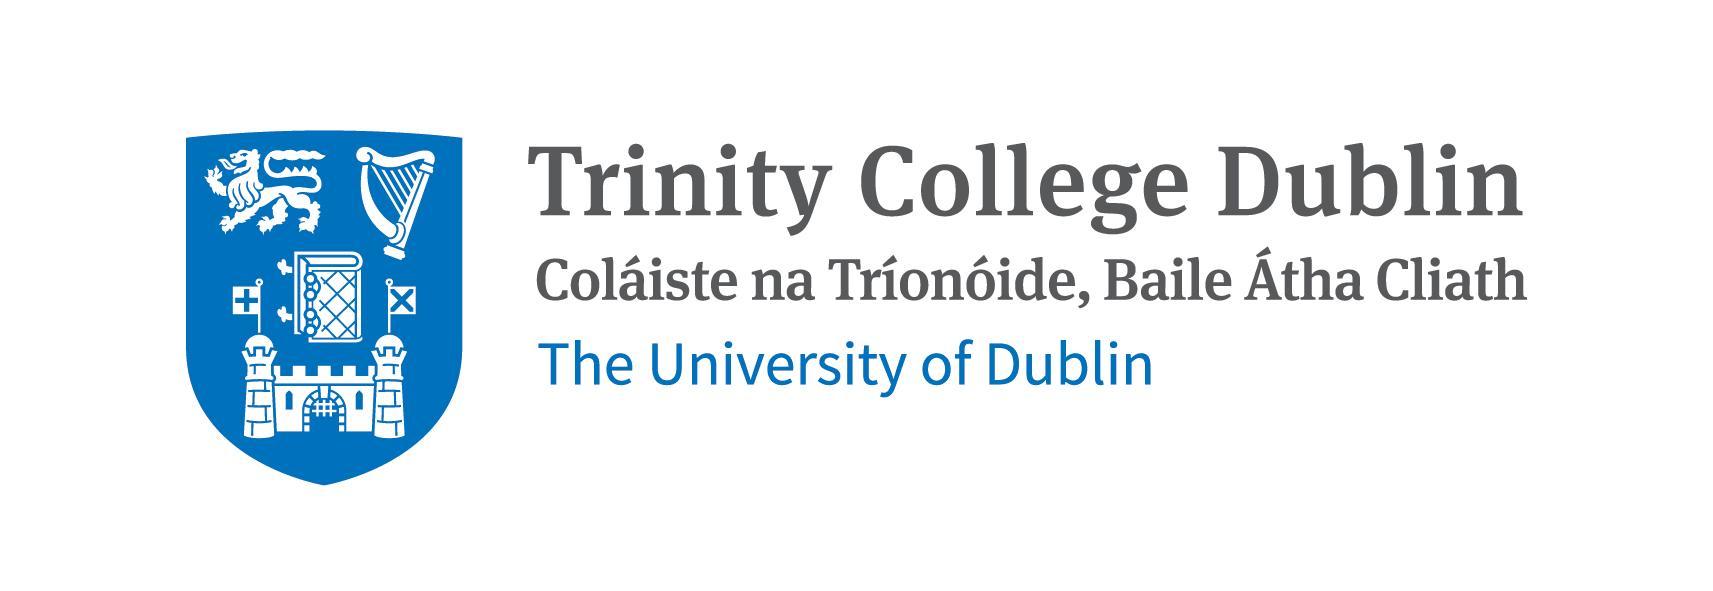 alt - Ирландия, Trinity College Dublin, Бакалавриат,Магистратура, 7